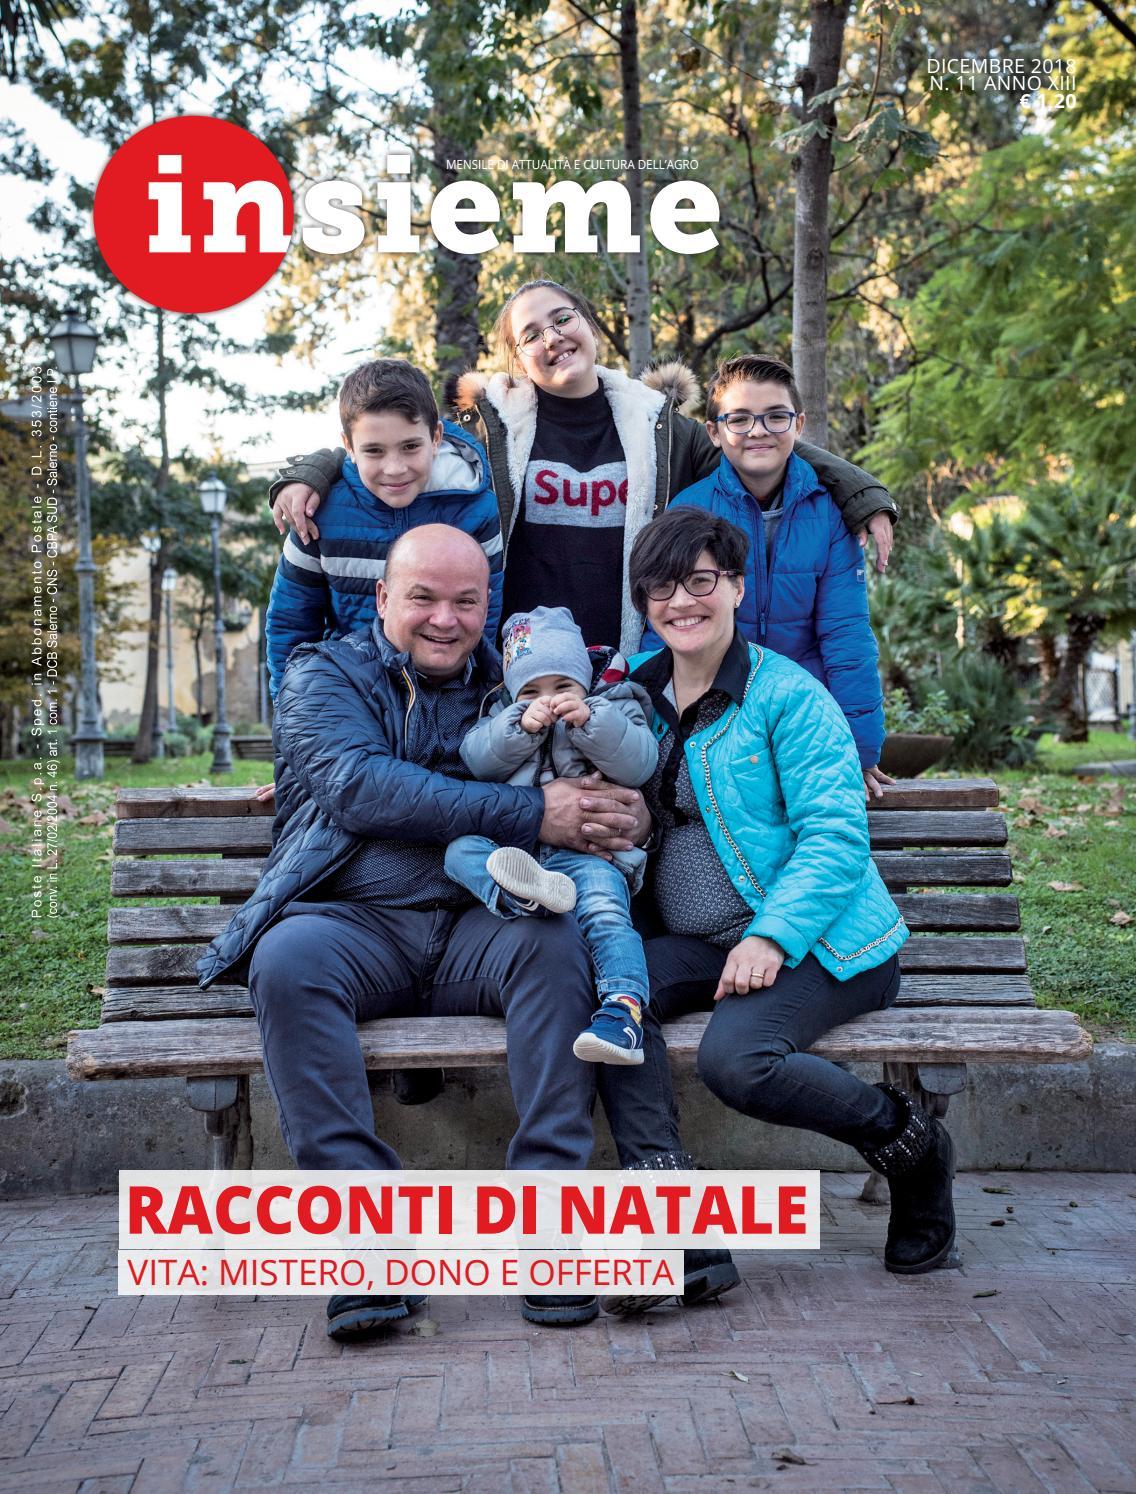 Cucina Della Mamma Nocera Inferiore insieme - dicembre 2018 by diocesi nocera inferiore-sarno